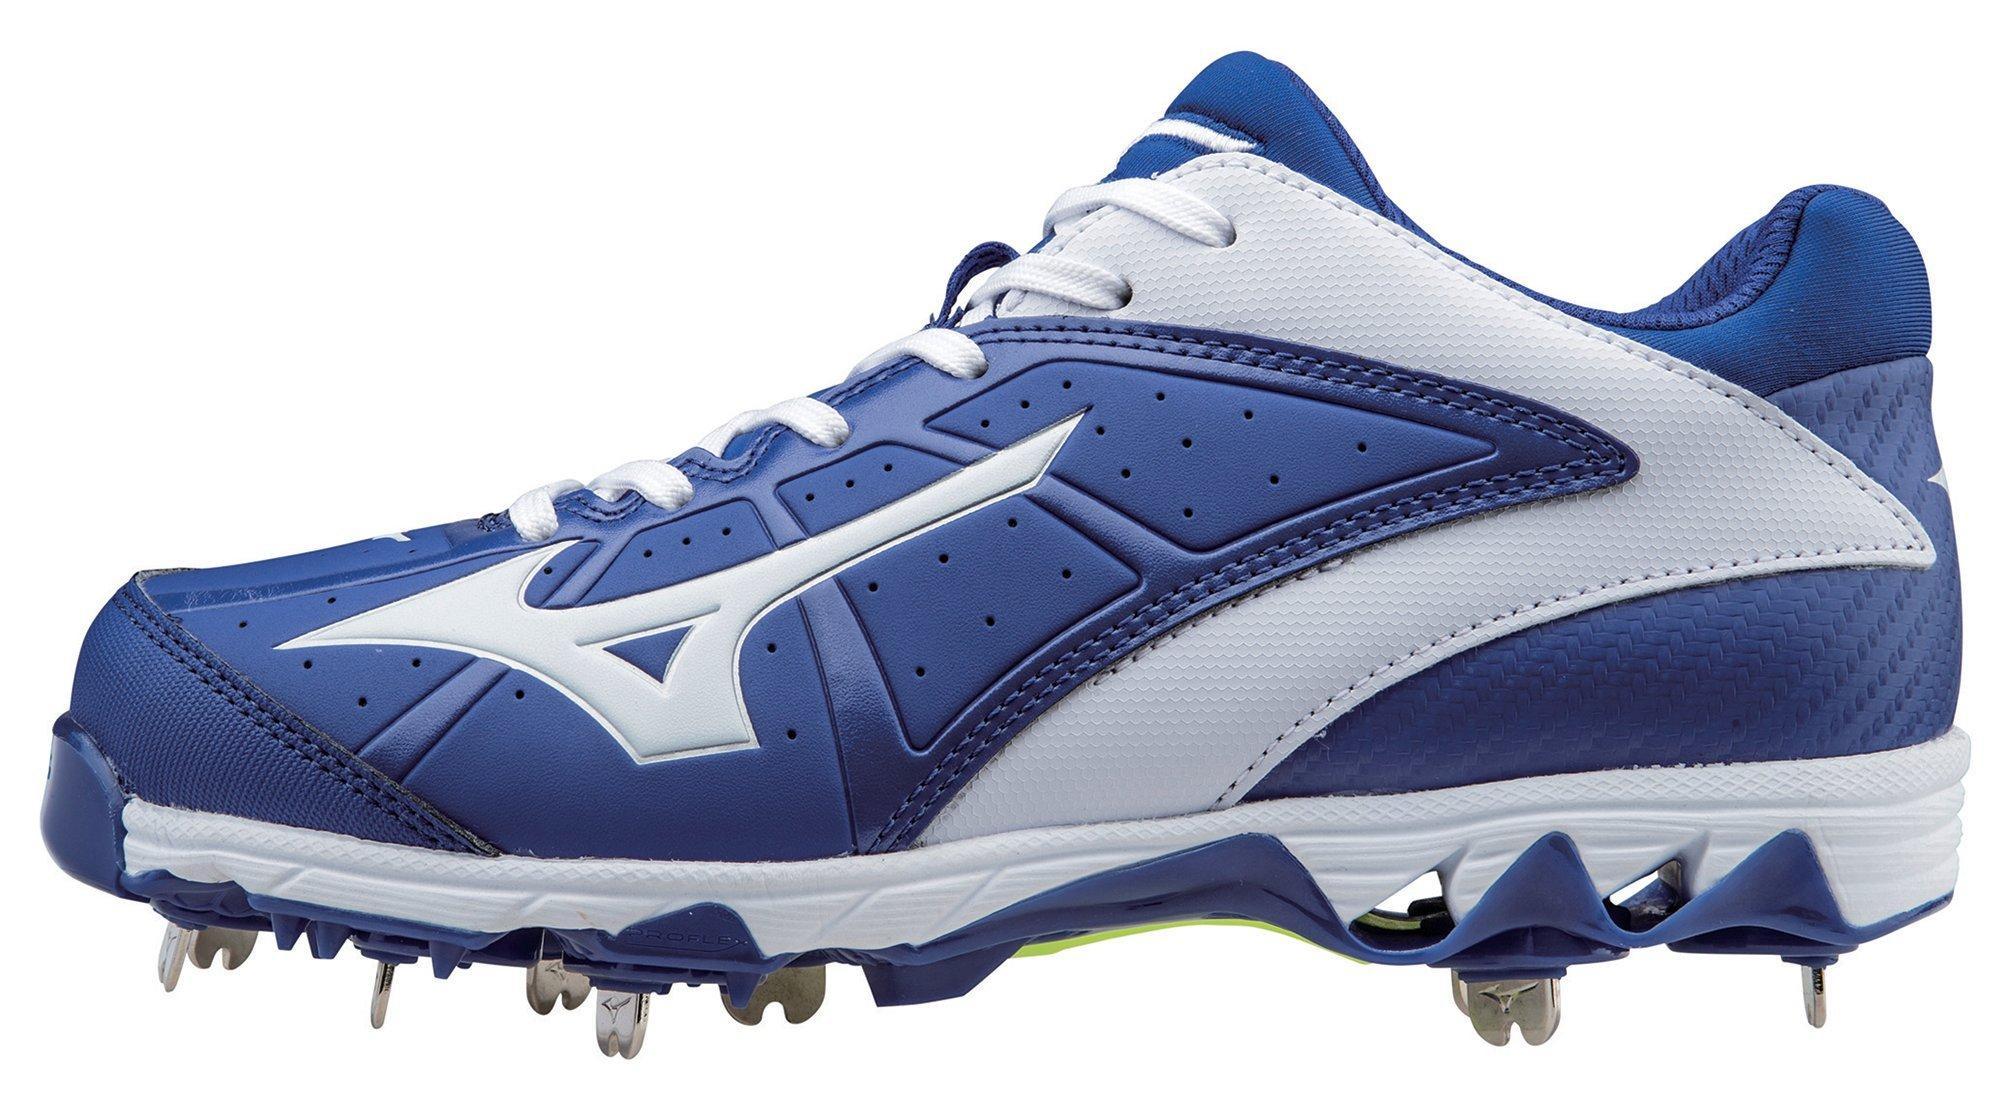 5d84f294f4c9 Baseball & Softball Cleats | Rakuten.com